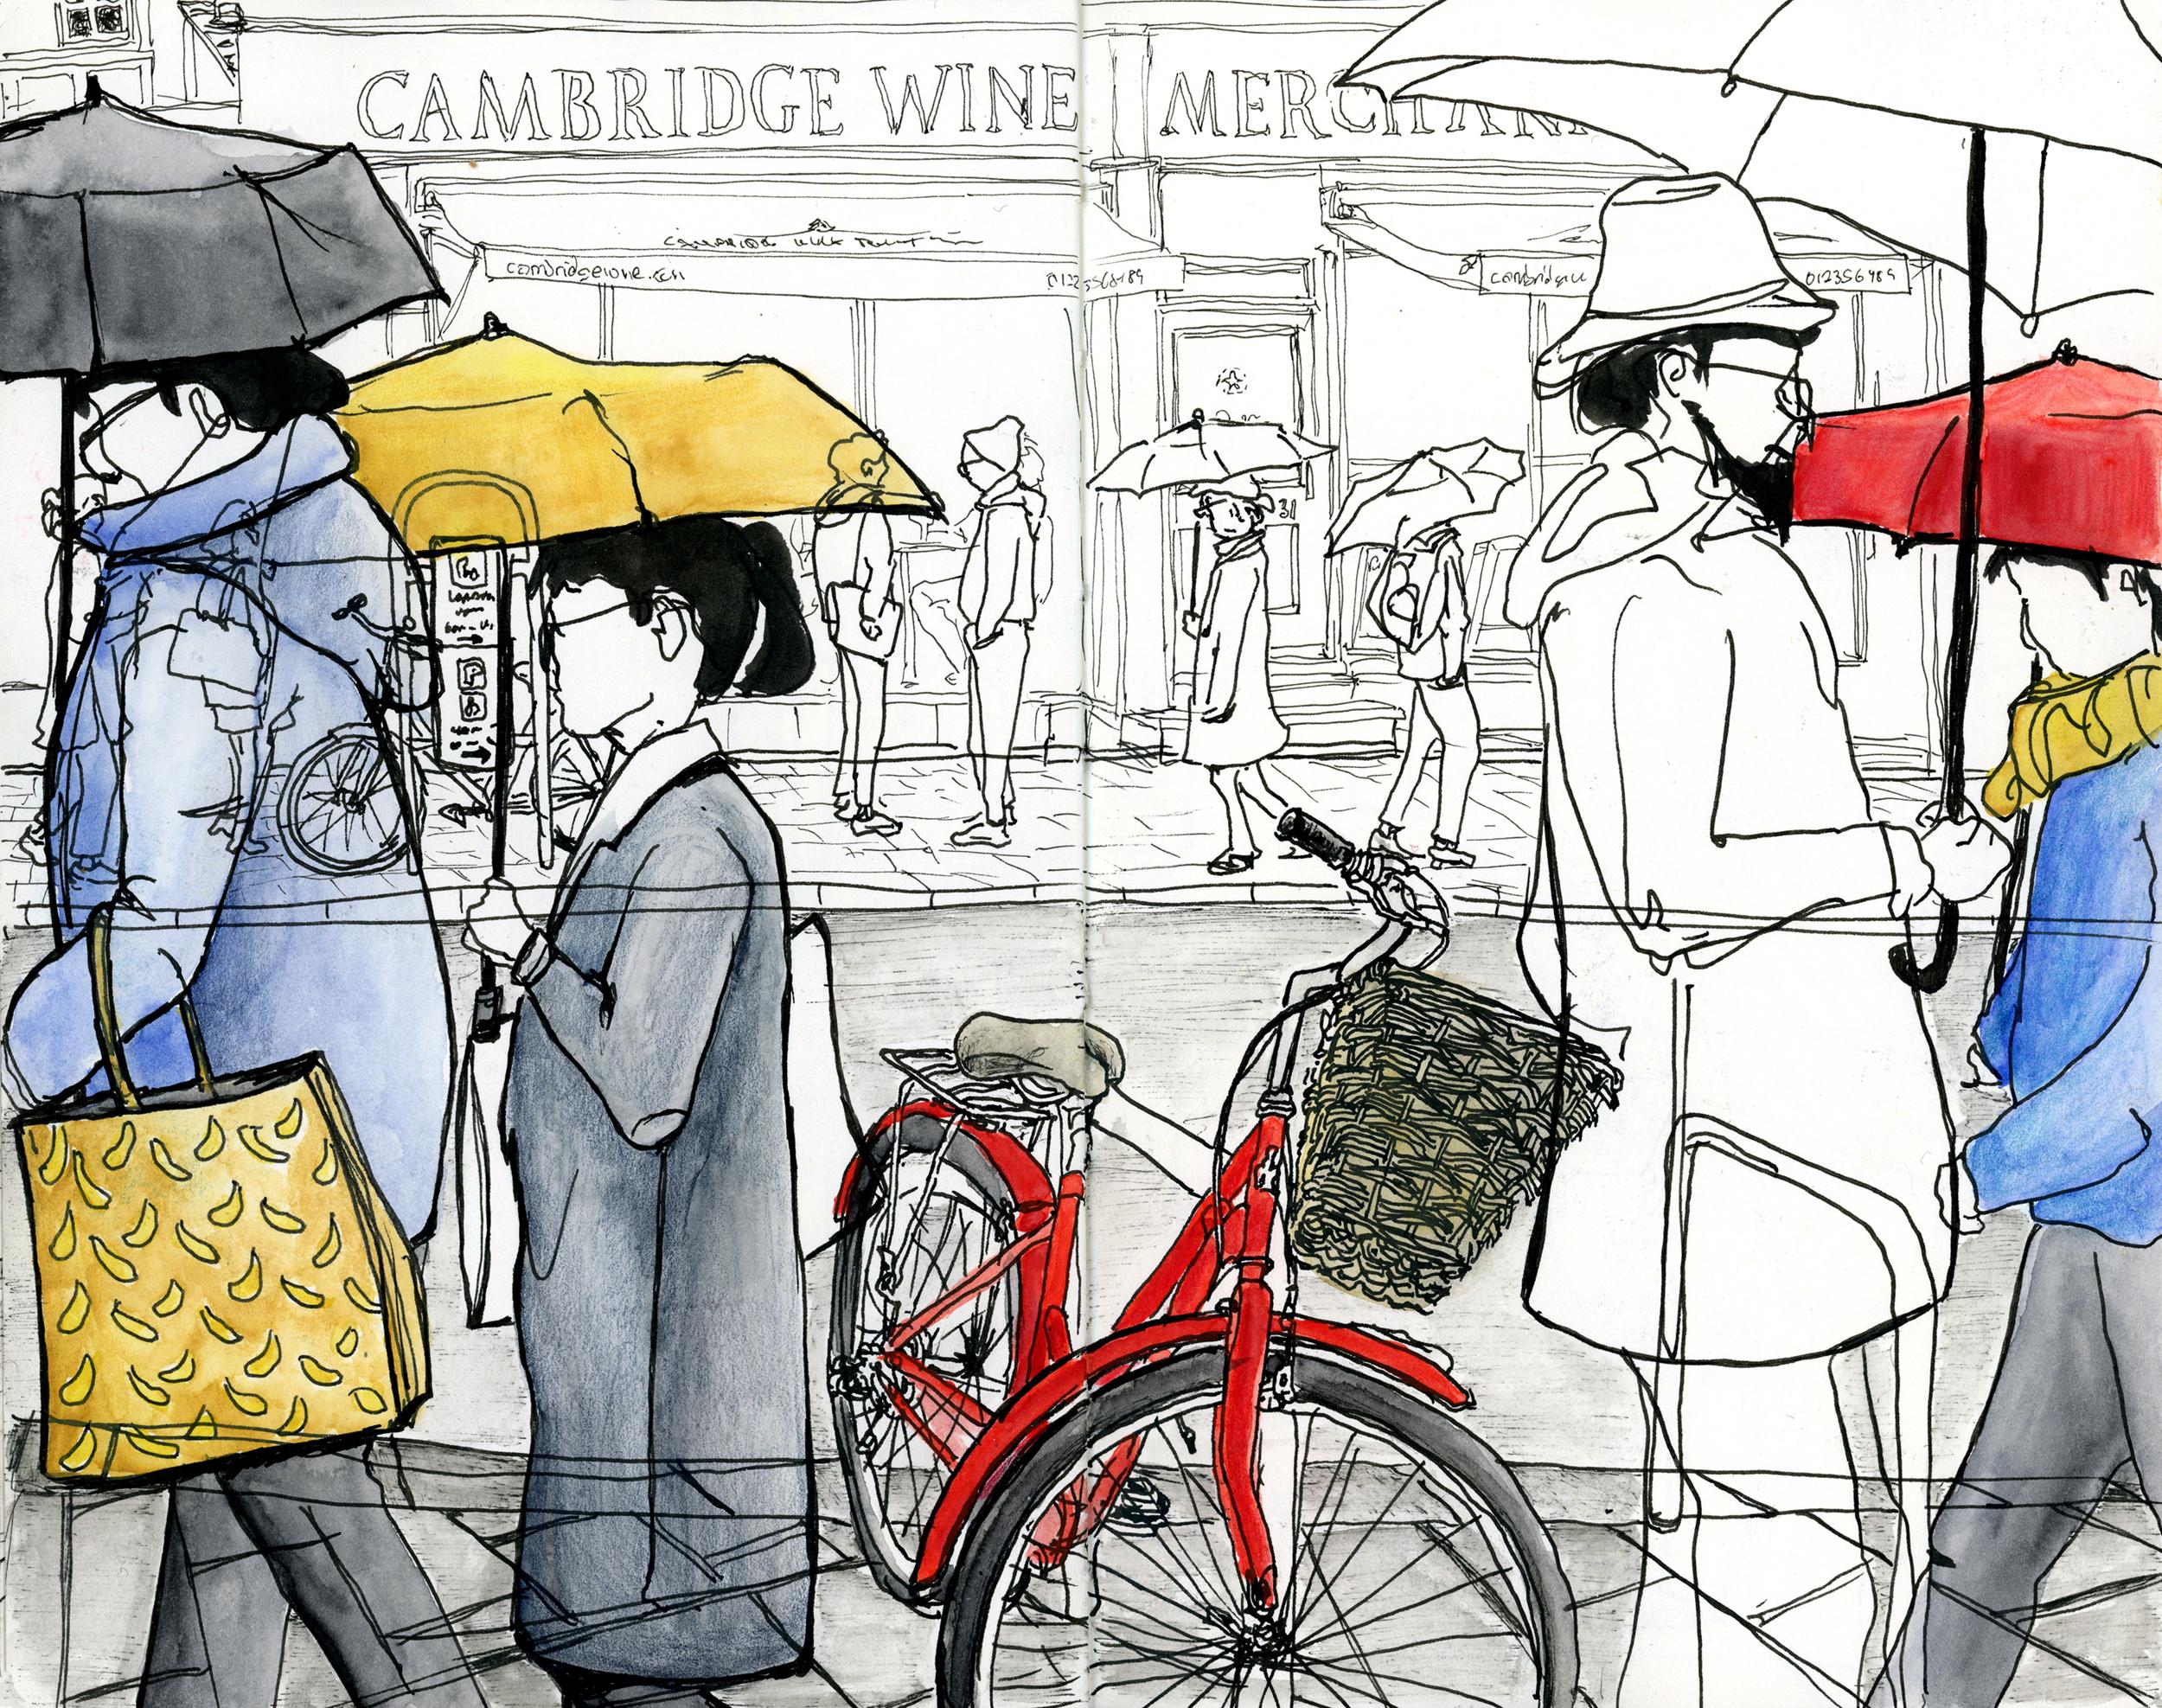 umbrella afternoon - for web.jpg